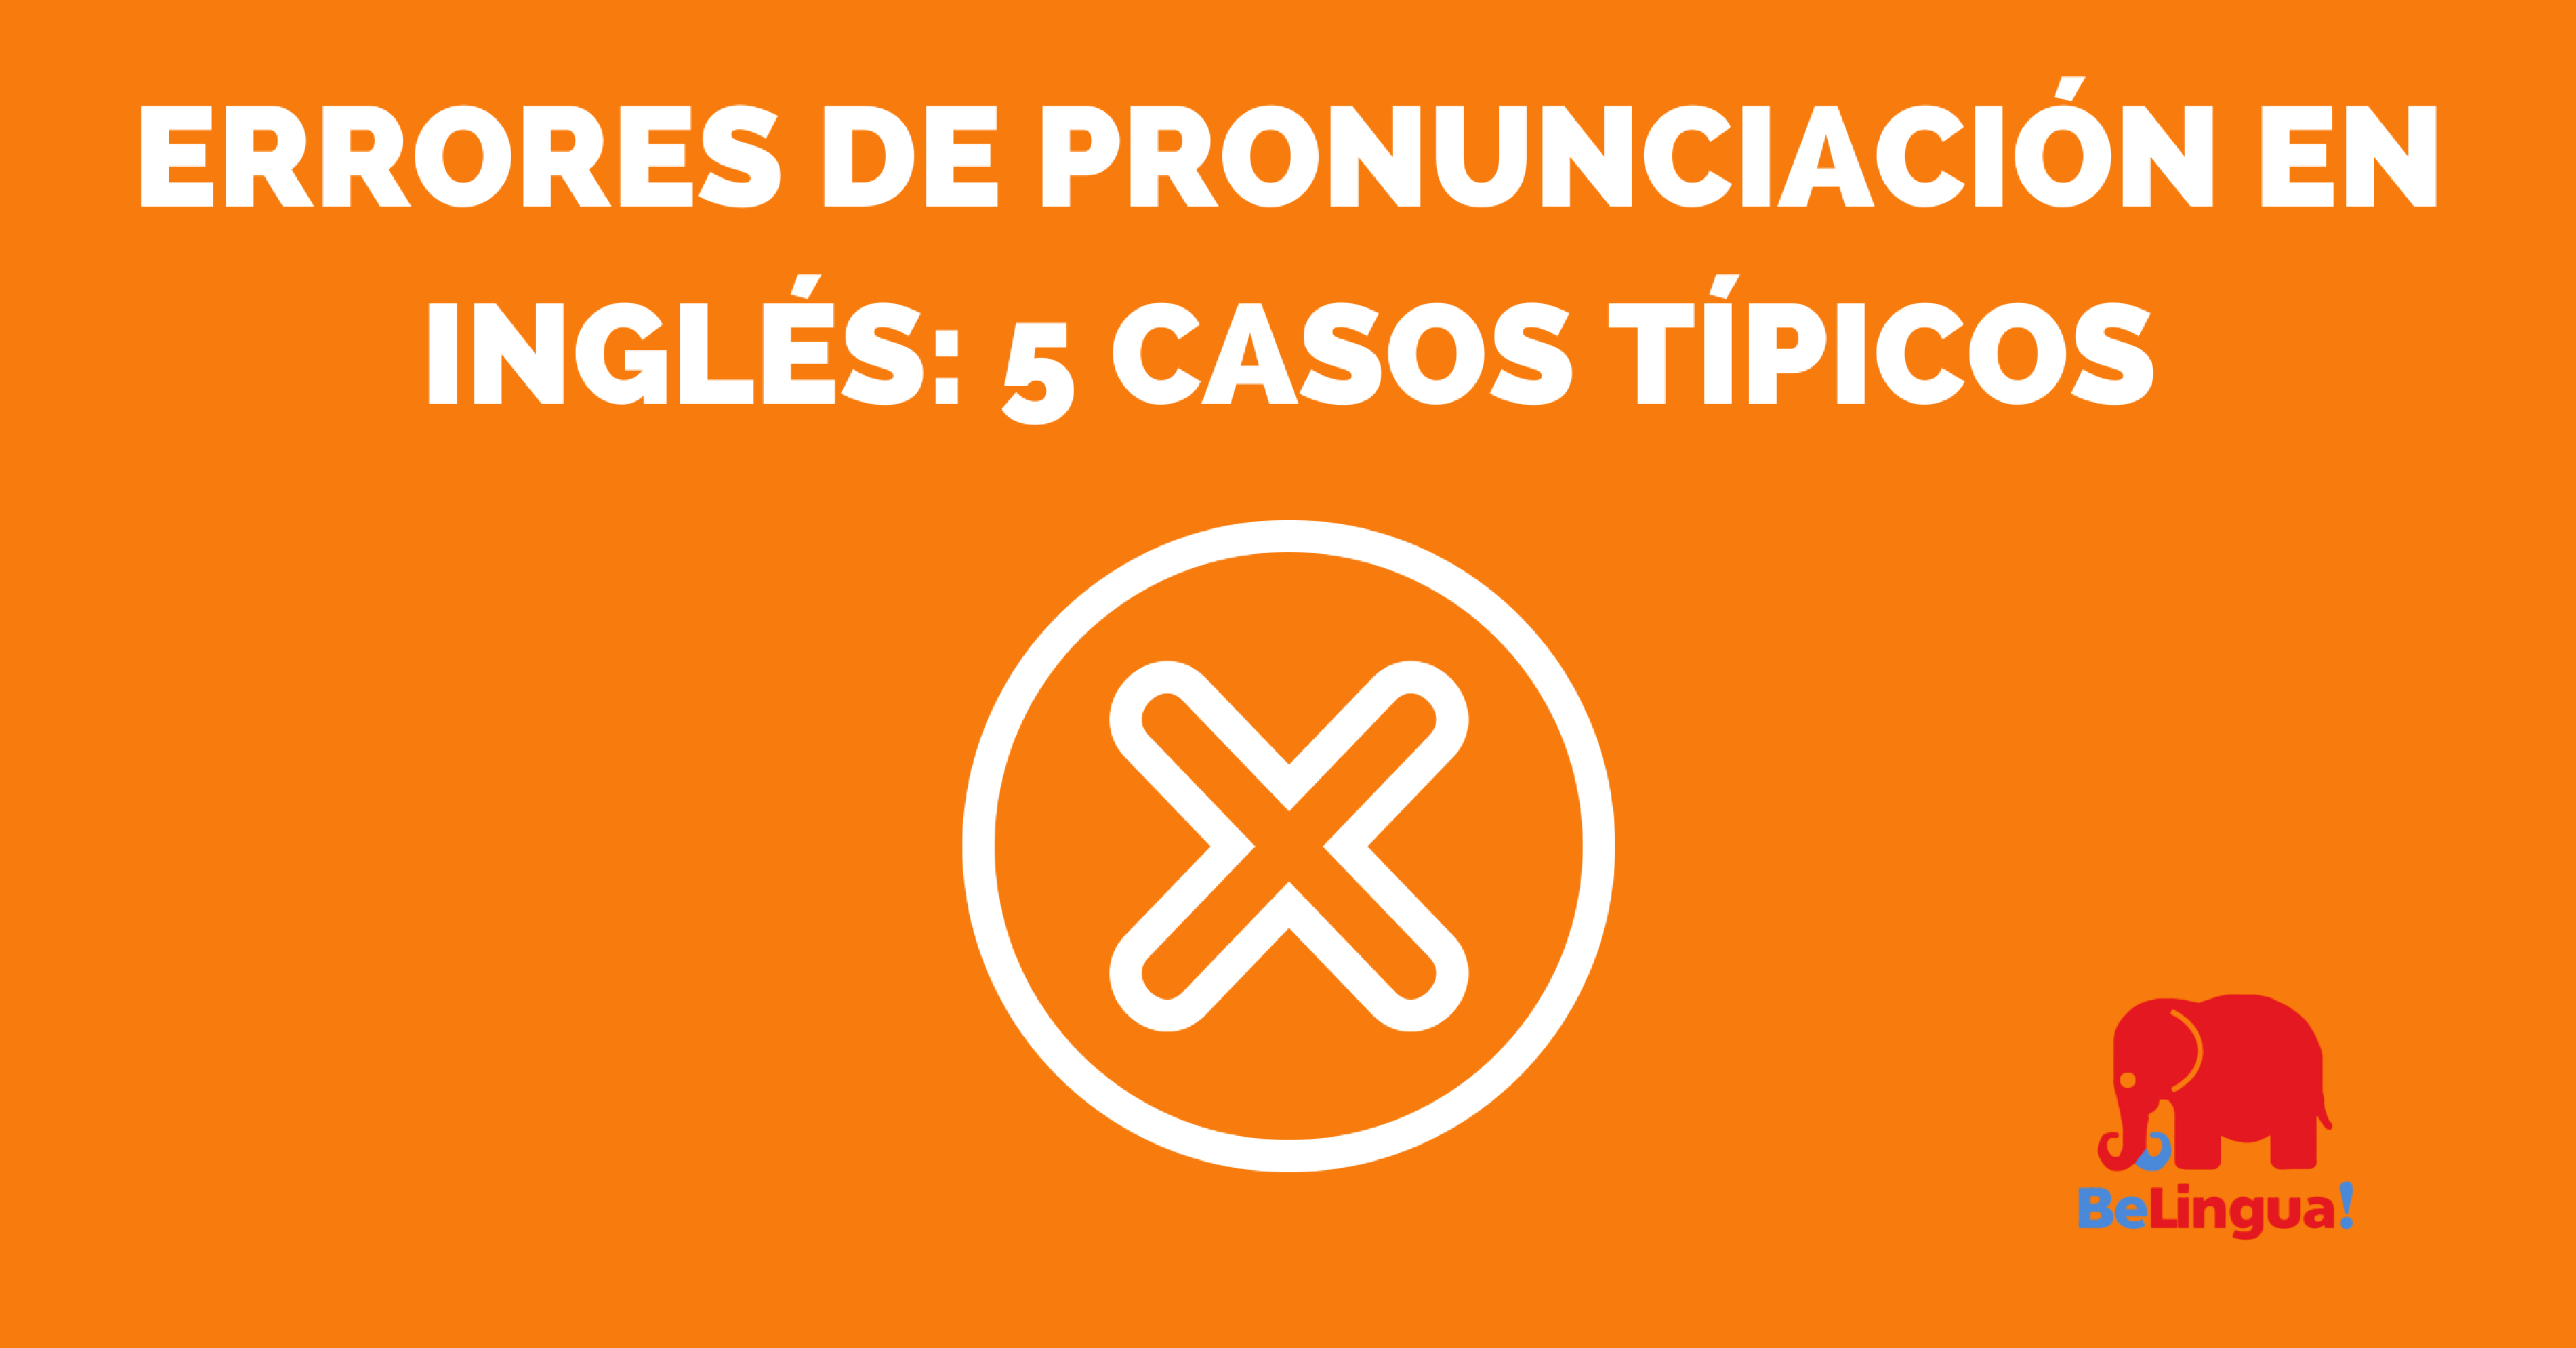 Errores de pronunciación en inglés: 5 casos típicos